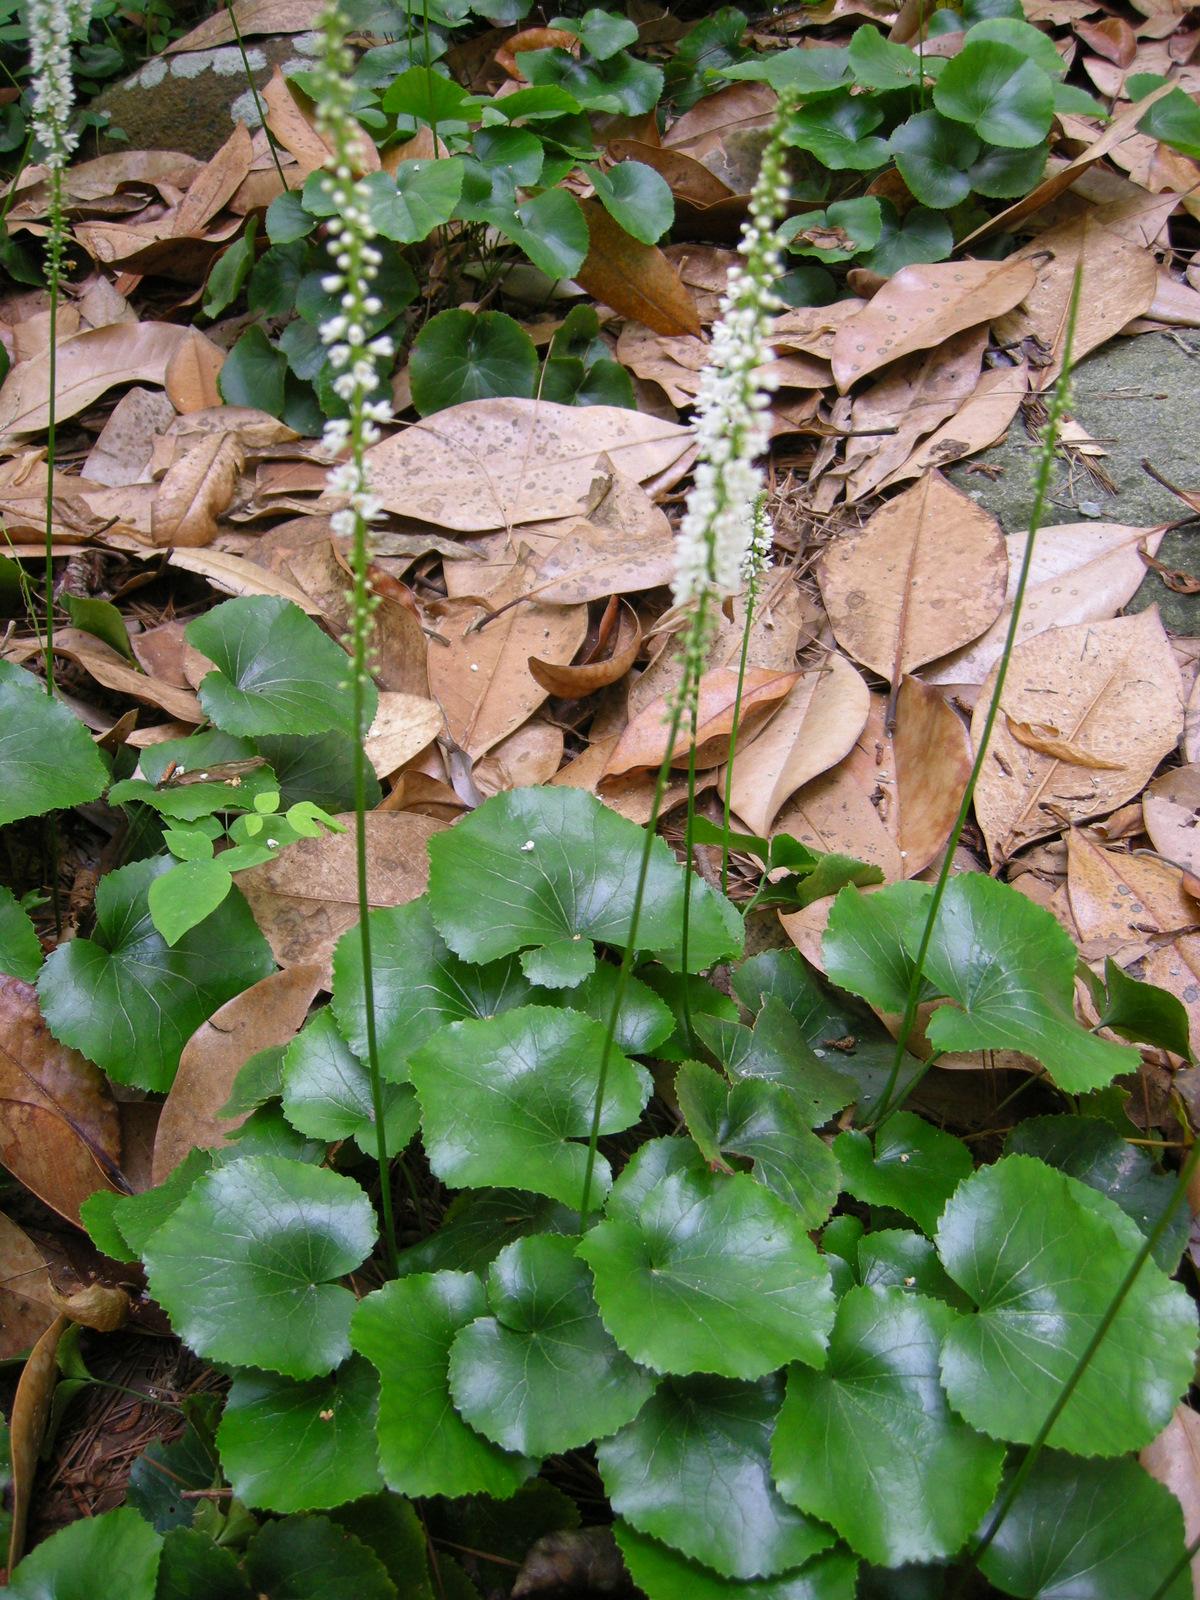 The wildlife garden in the h l blomquist garden of native plants - I